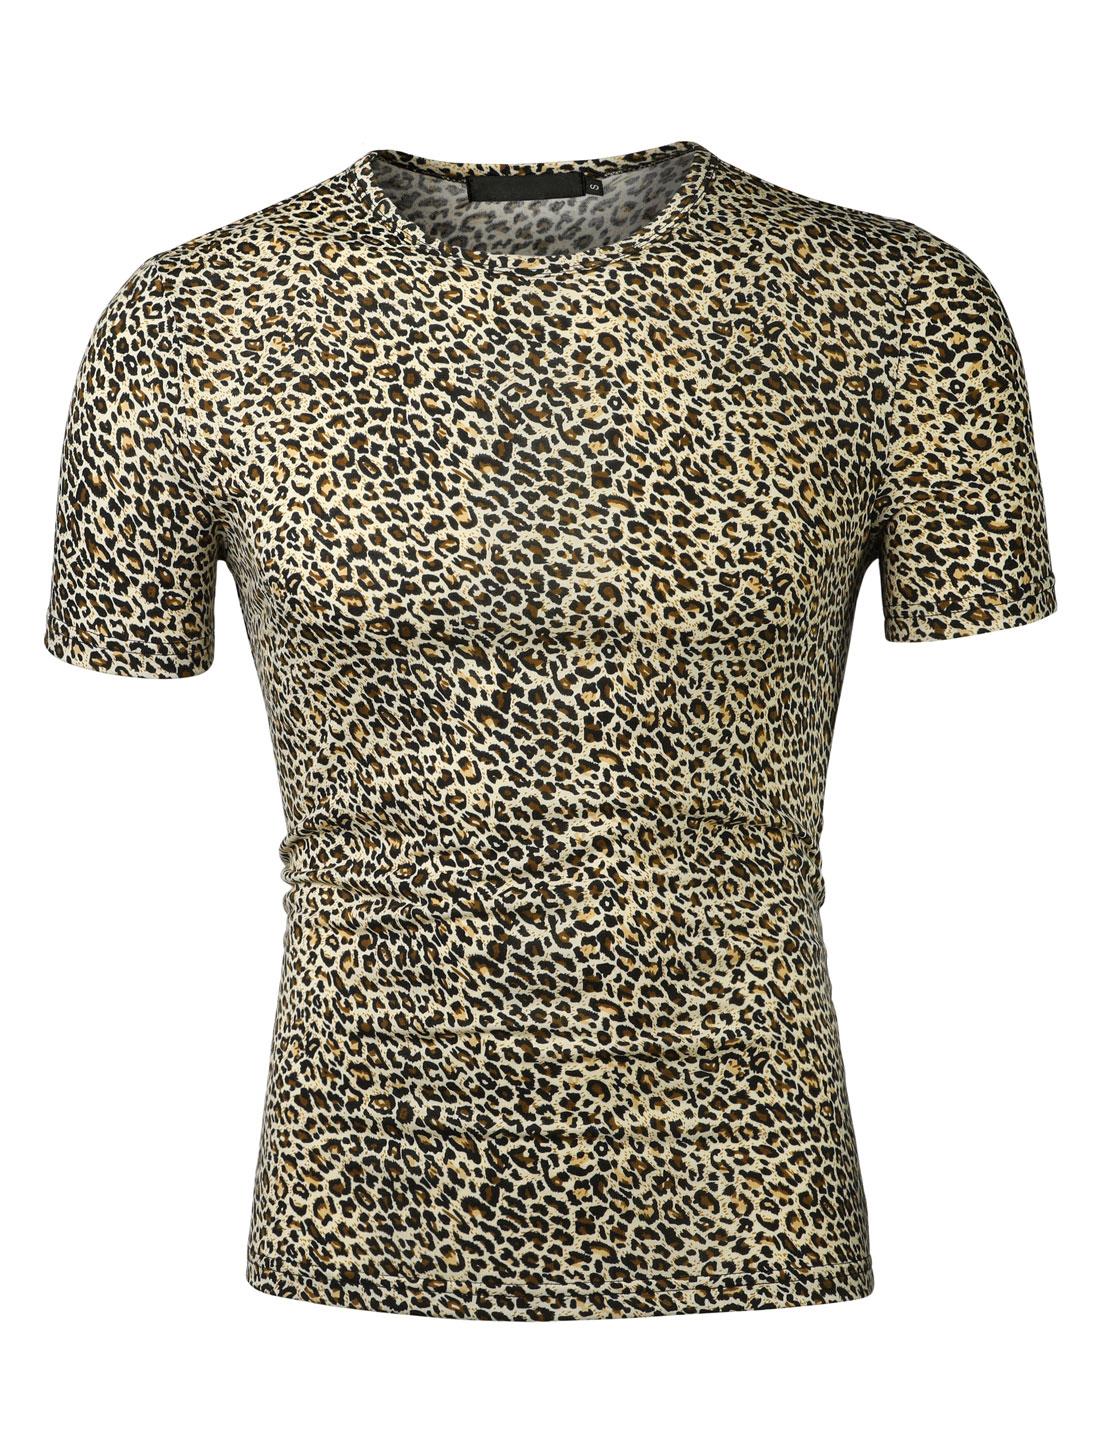 Men Slipover Leopard Prints Stretchy Tee Shirt Beige Black M